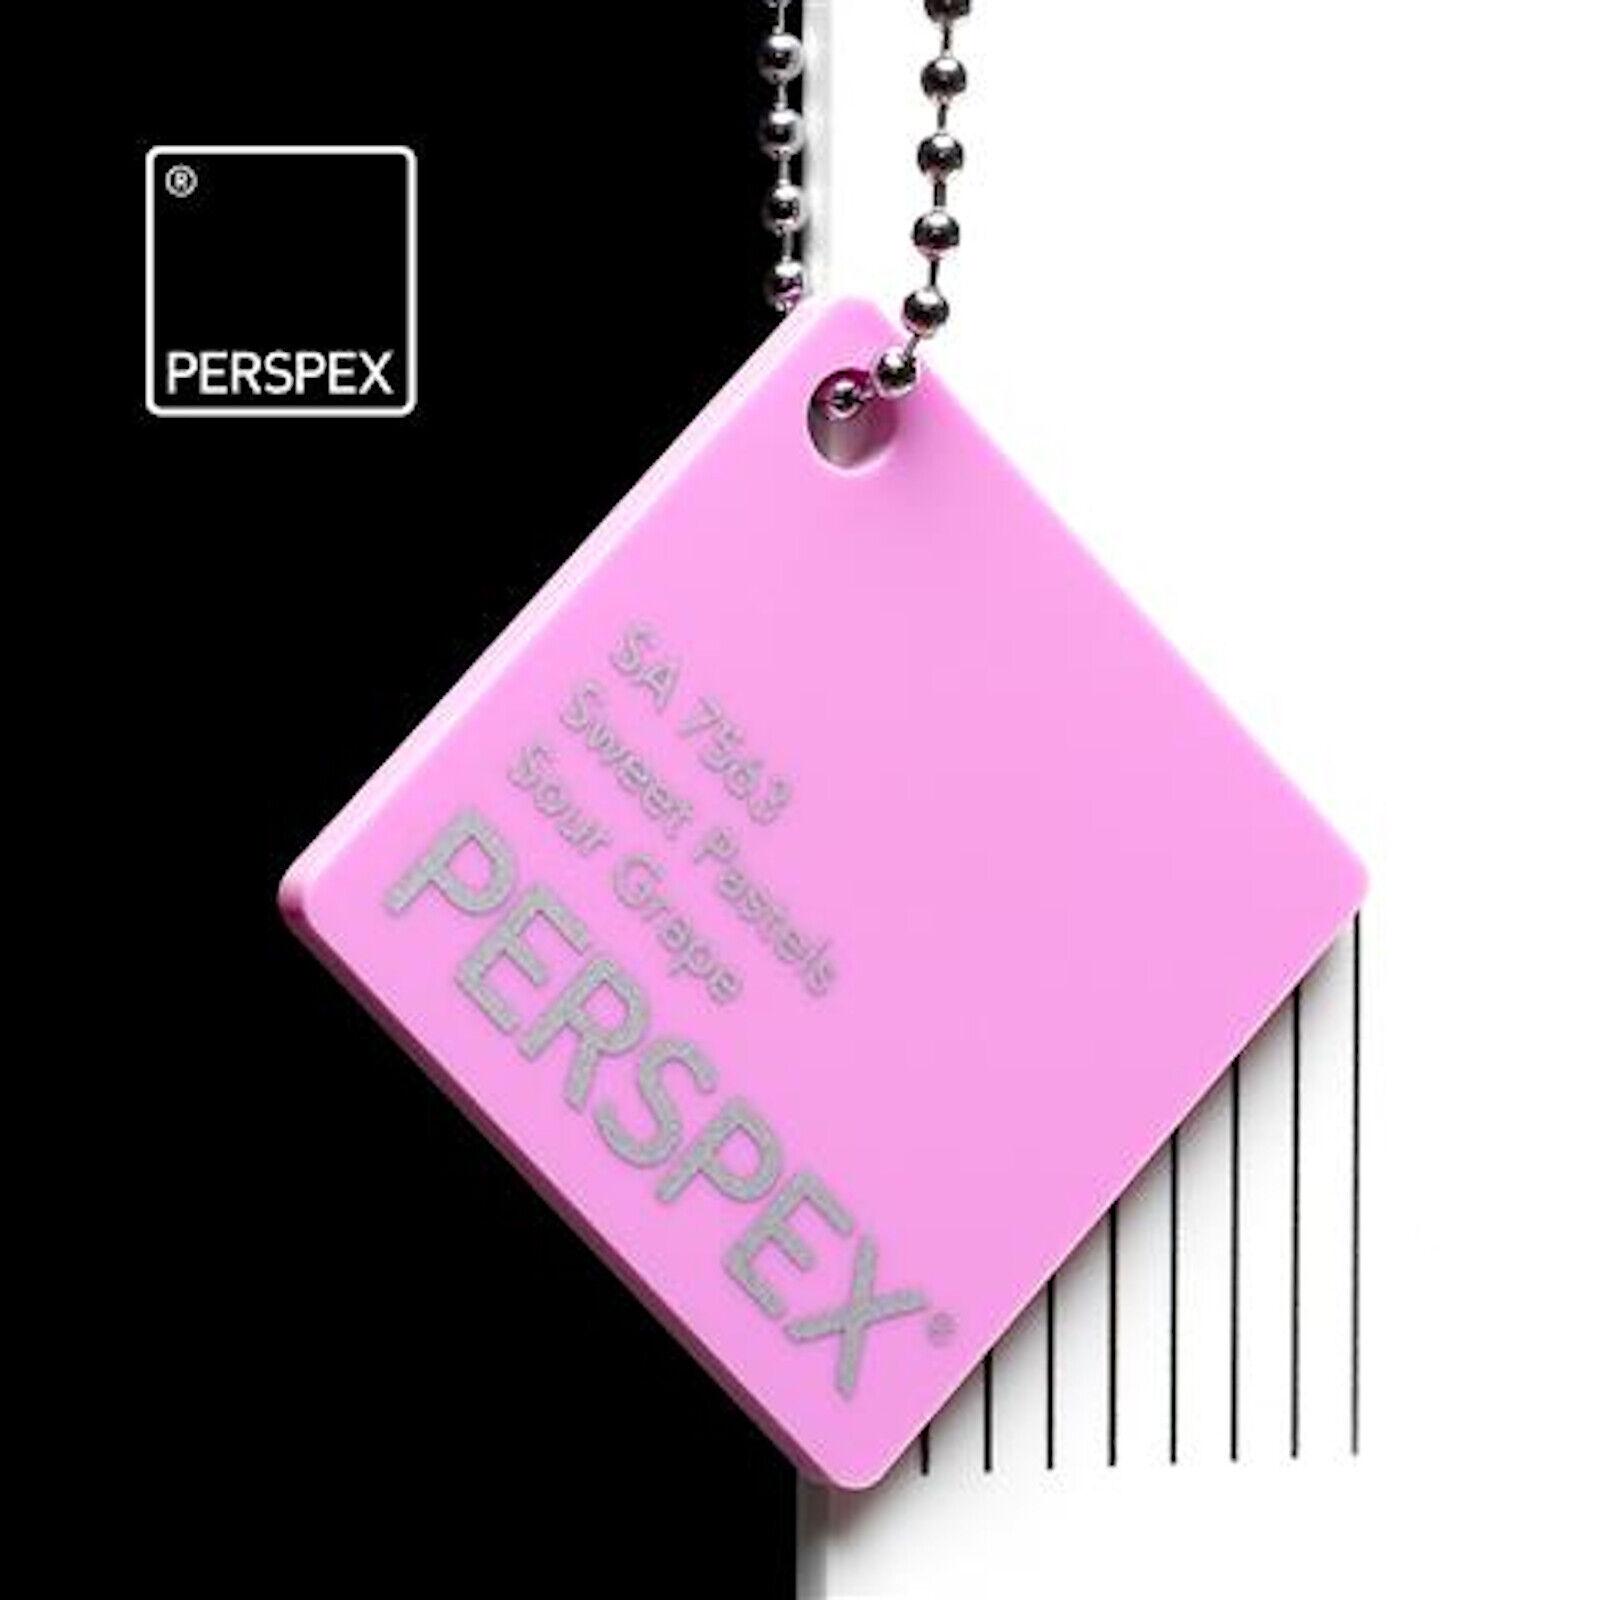 3mm Perspex® Sour Grape SA7563 Acrylic Plastic Sheet Panel Various sizes